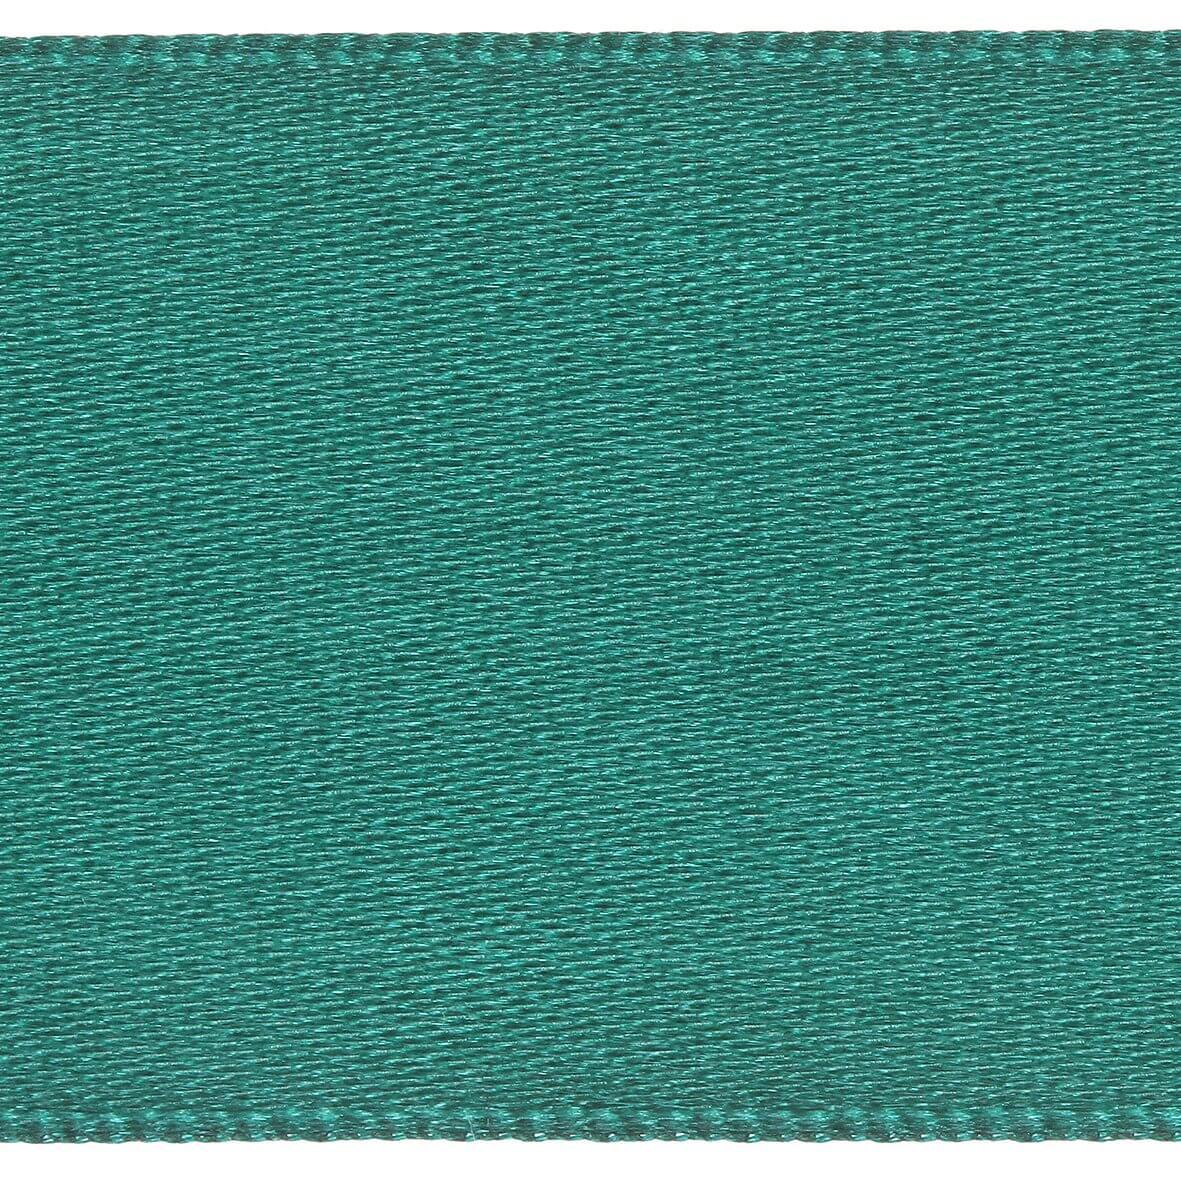 15mm Berisfords Satin Ribbon - Jade Colour 68